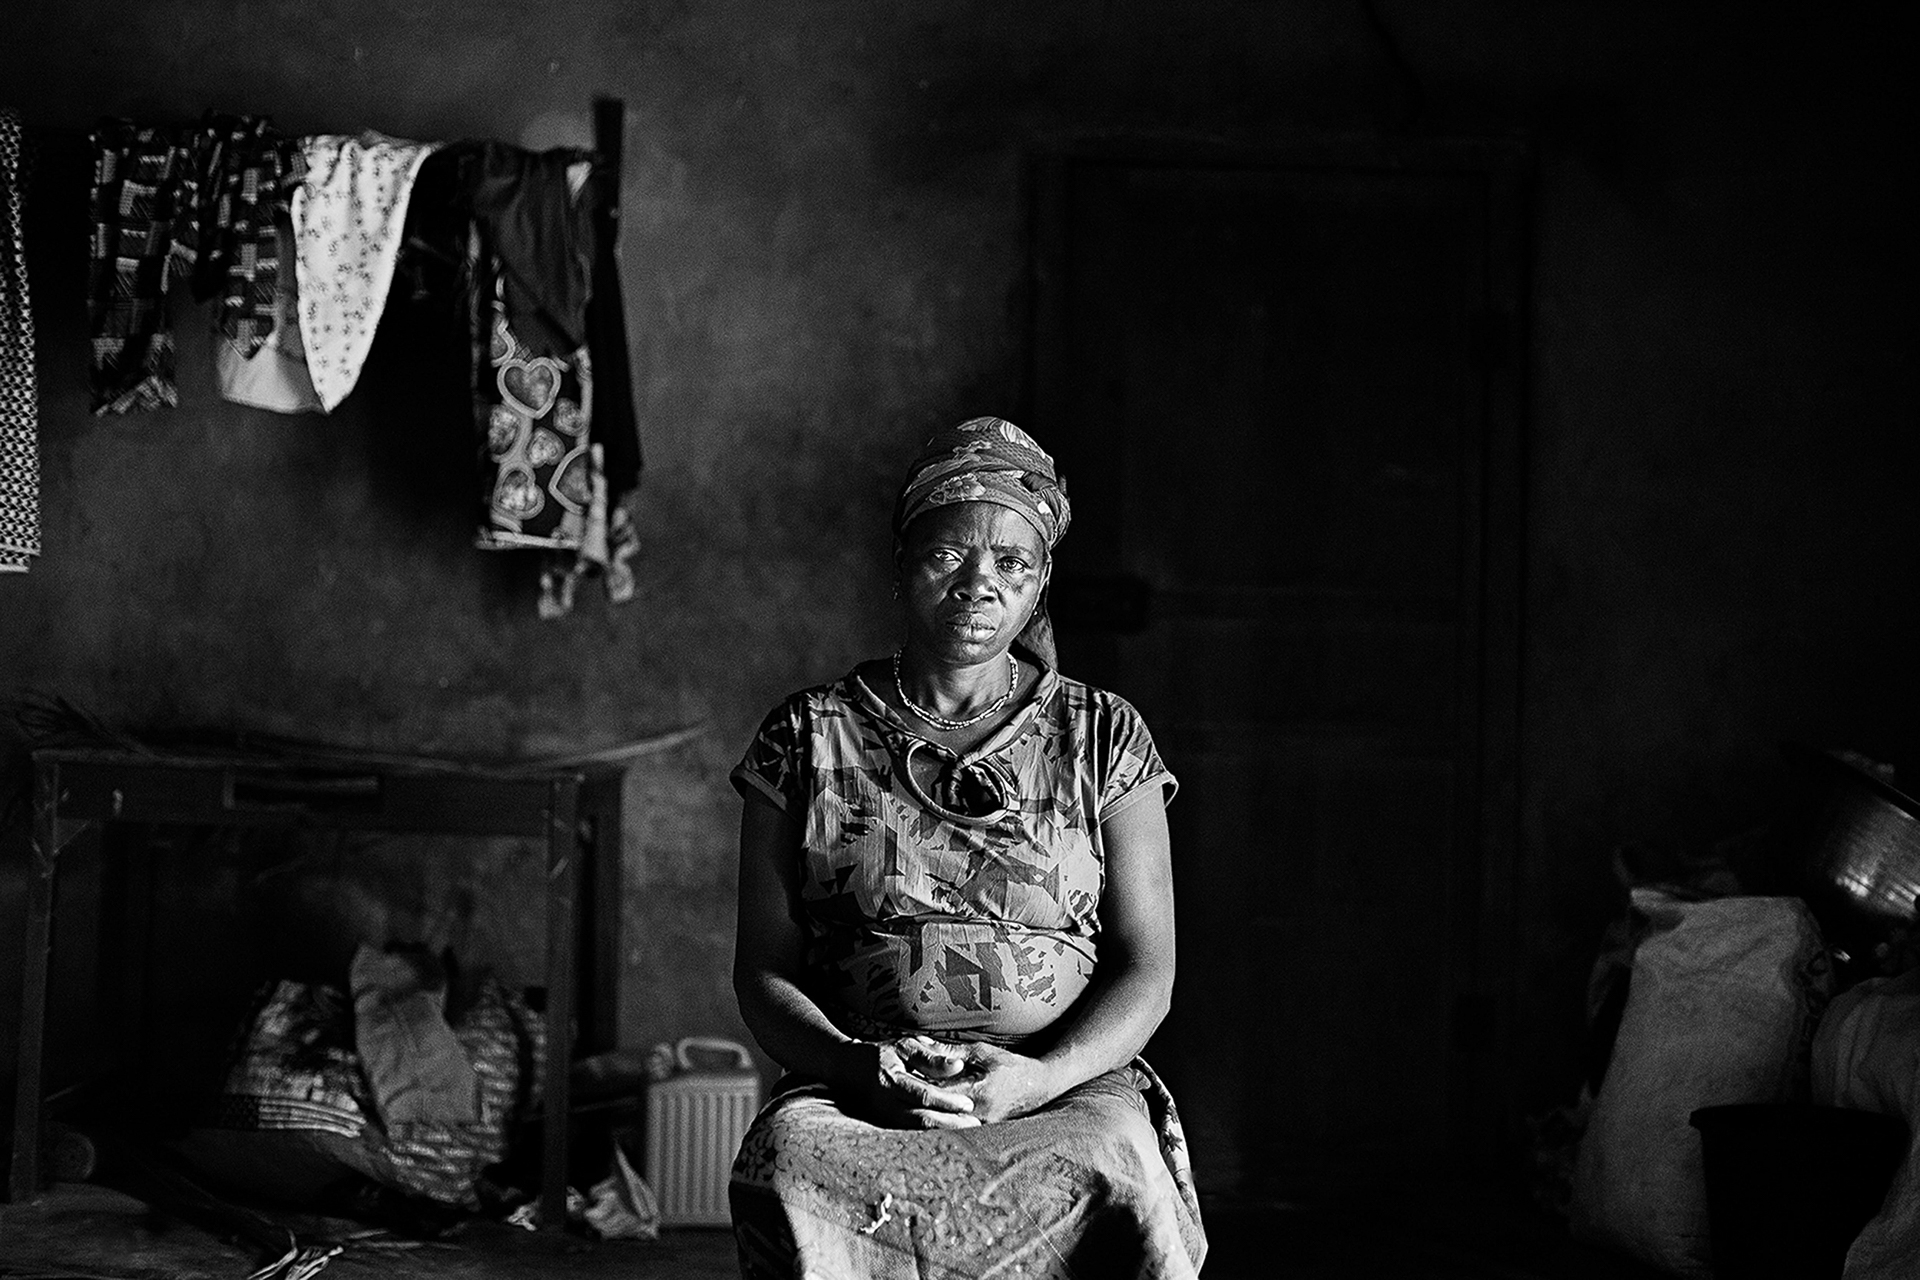 Nneka Iwunna Ezemezue_CAP_Prize_2018_1280px_height_RGB_0d1ff555abd4f530c5d512e946ea157d_original.jpg